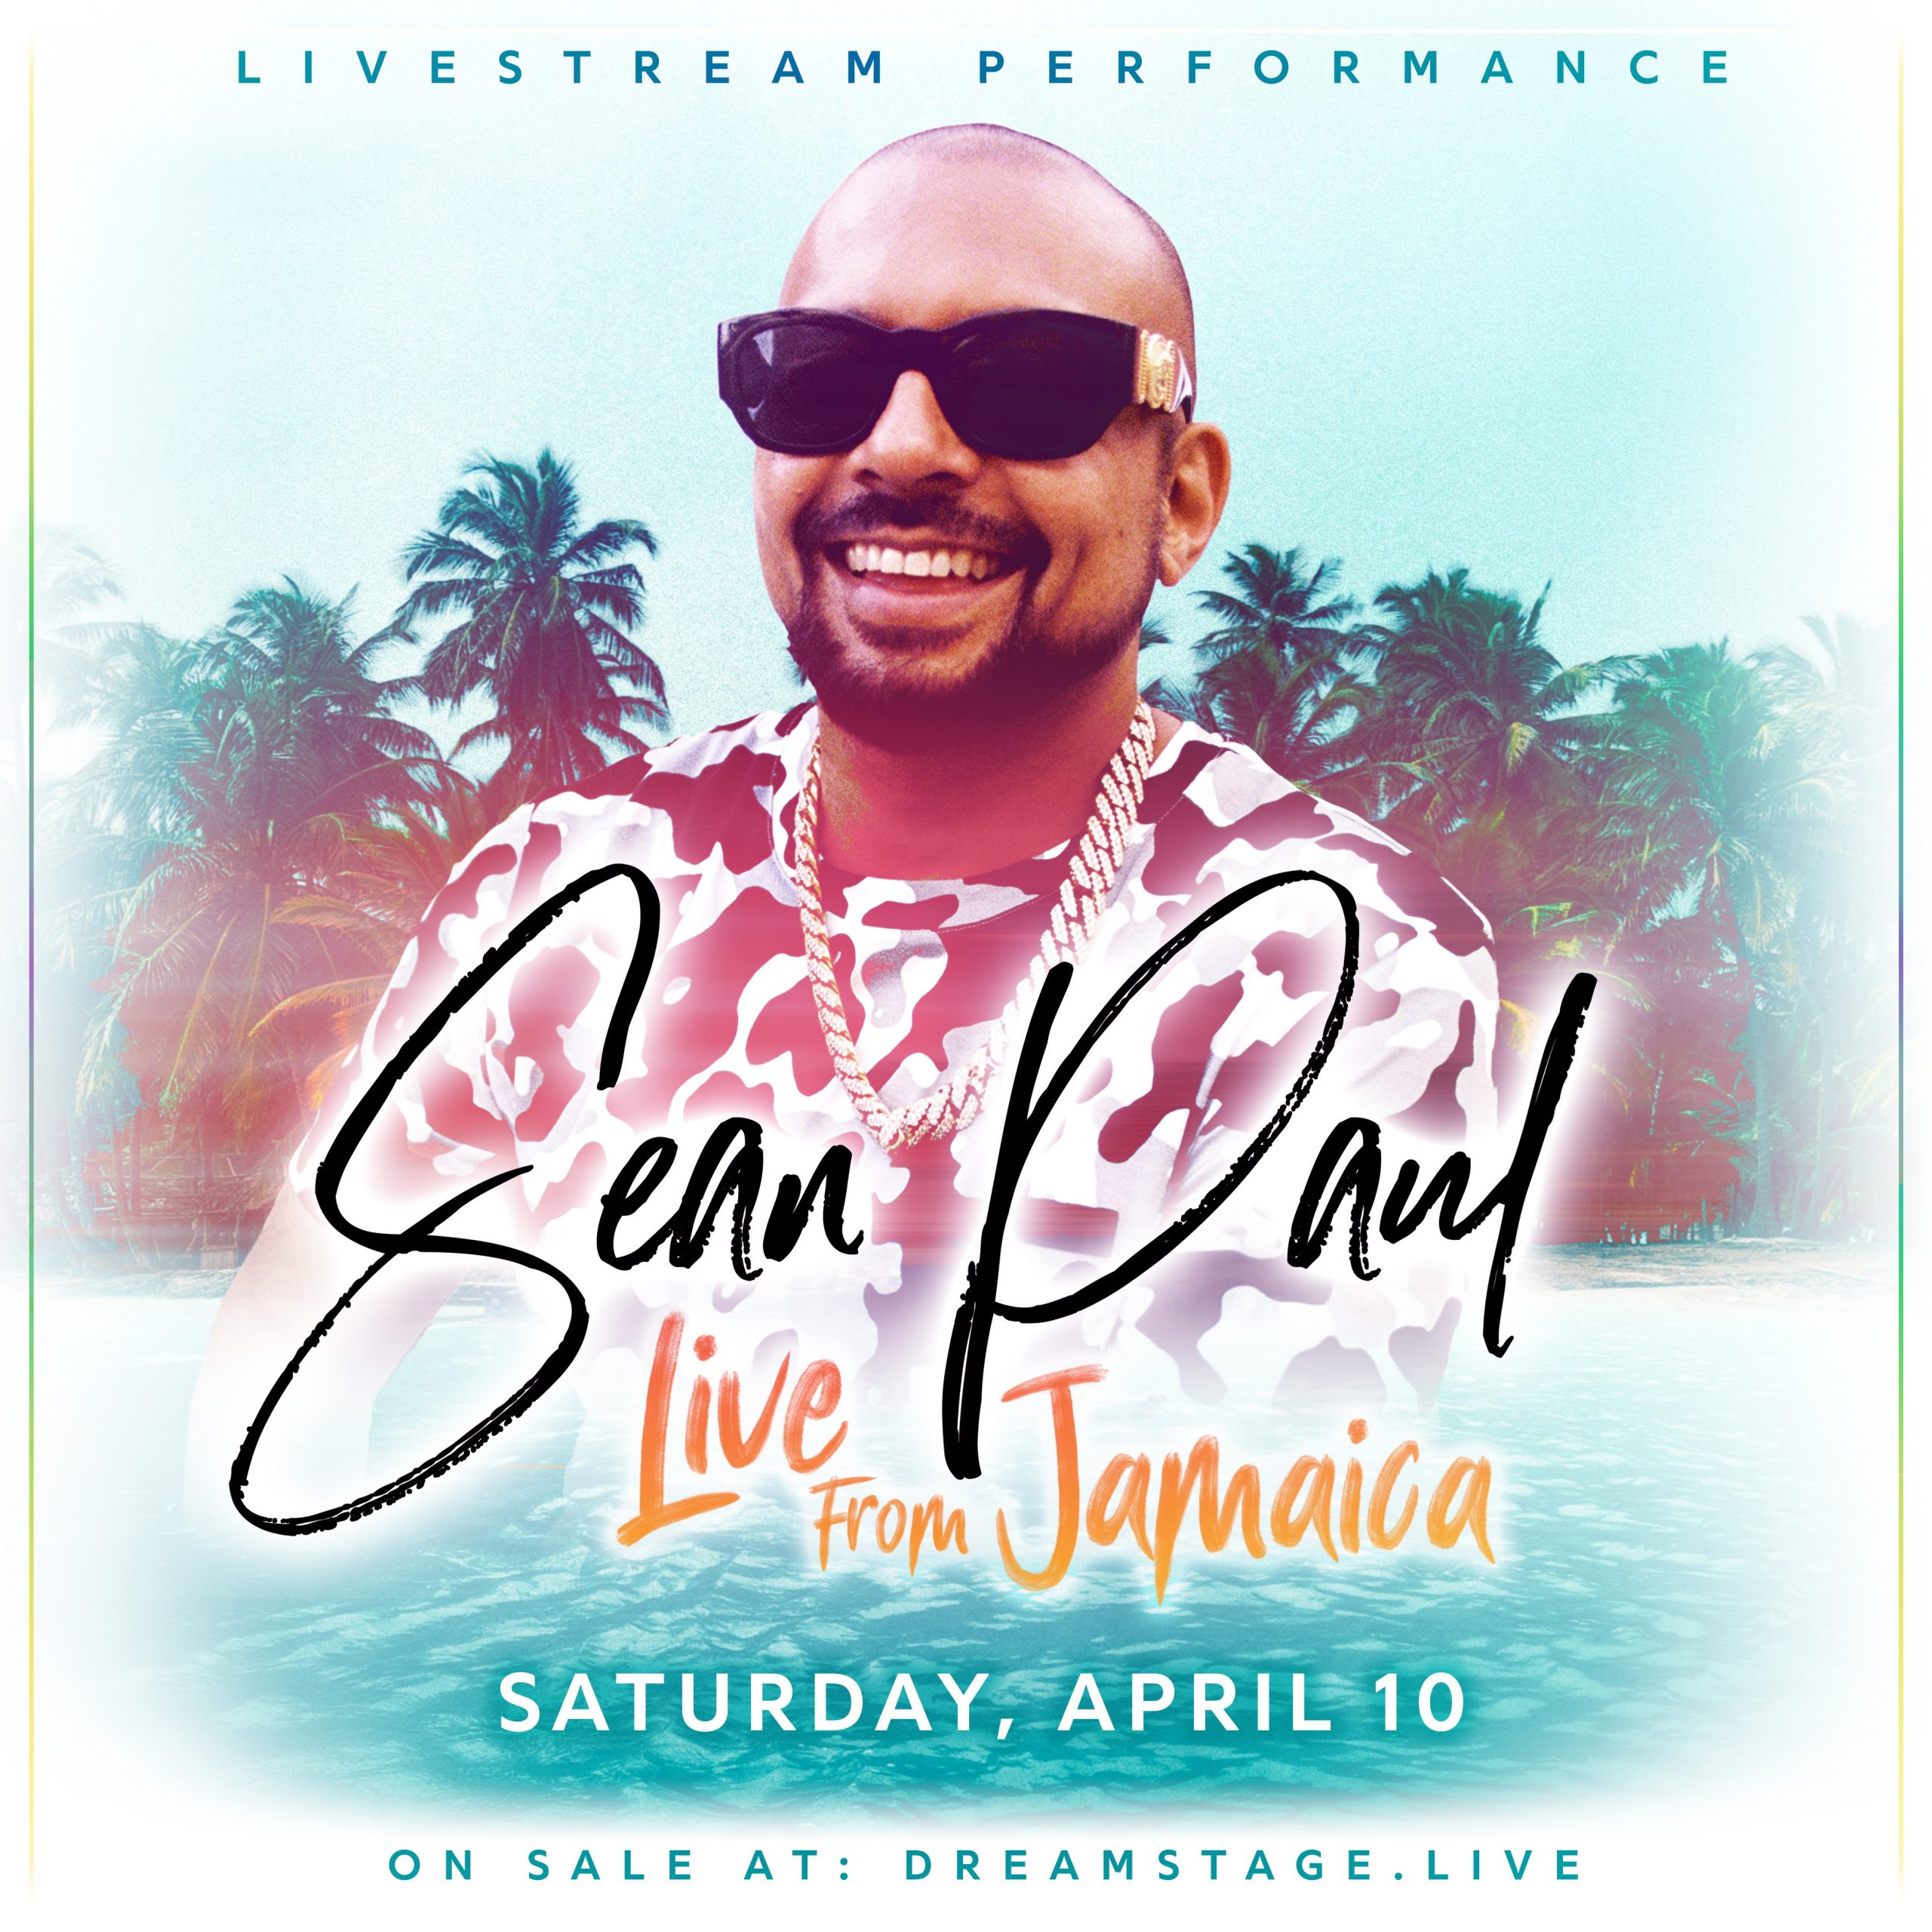 Sean Paul Brings Live Beach Concert From Jamaica To Virtual Venue Dreamstage